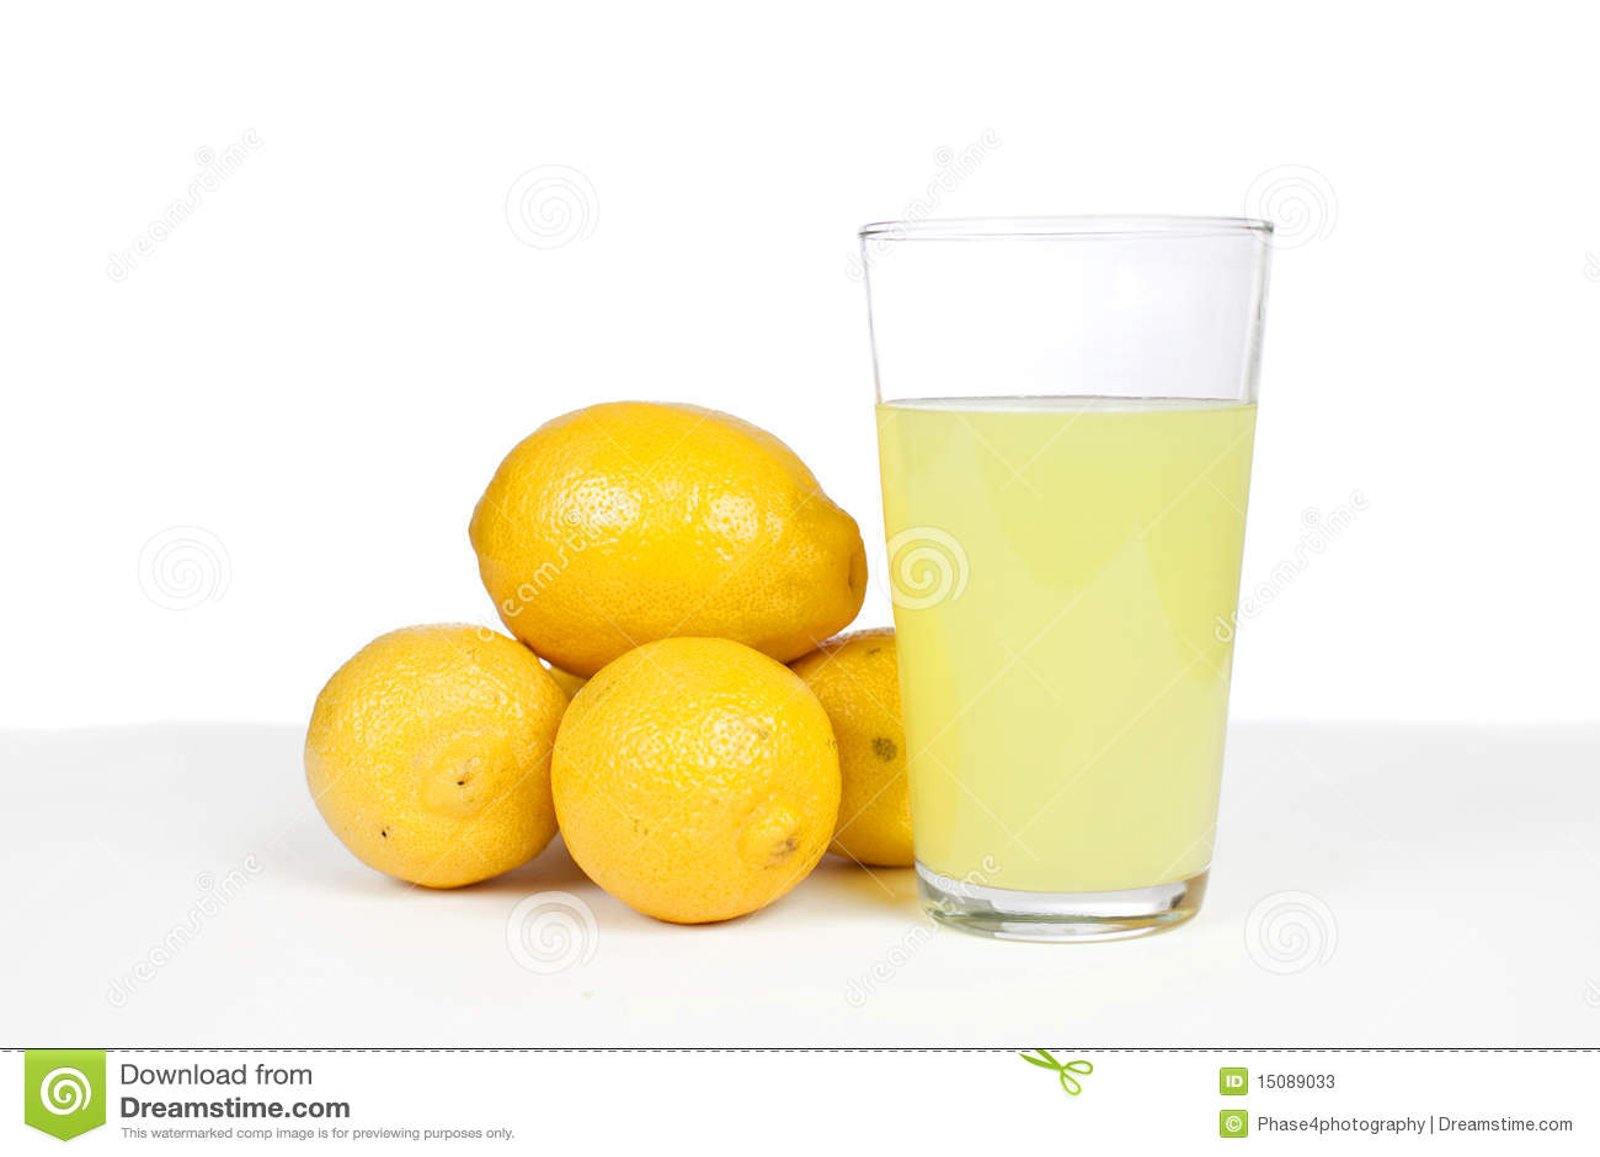 Lemonade, Lemons, Isolated, Clipping Path Royalty-Free ...